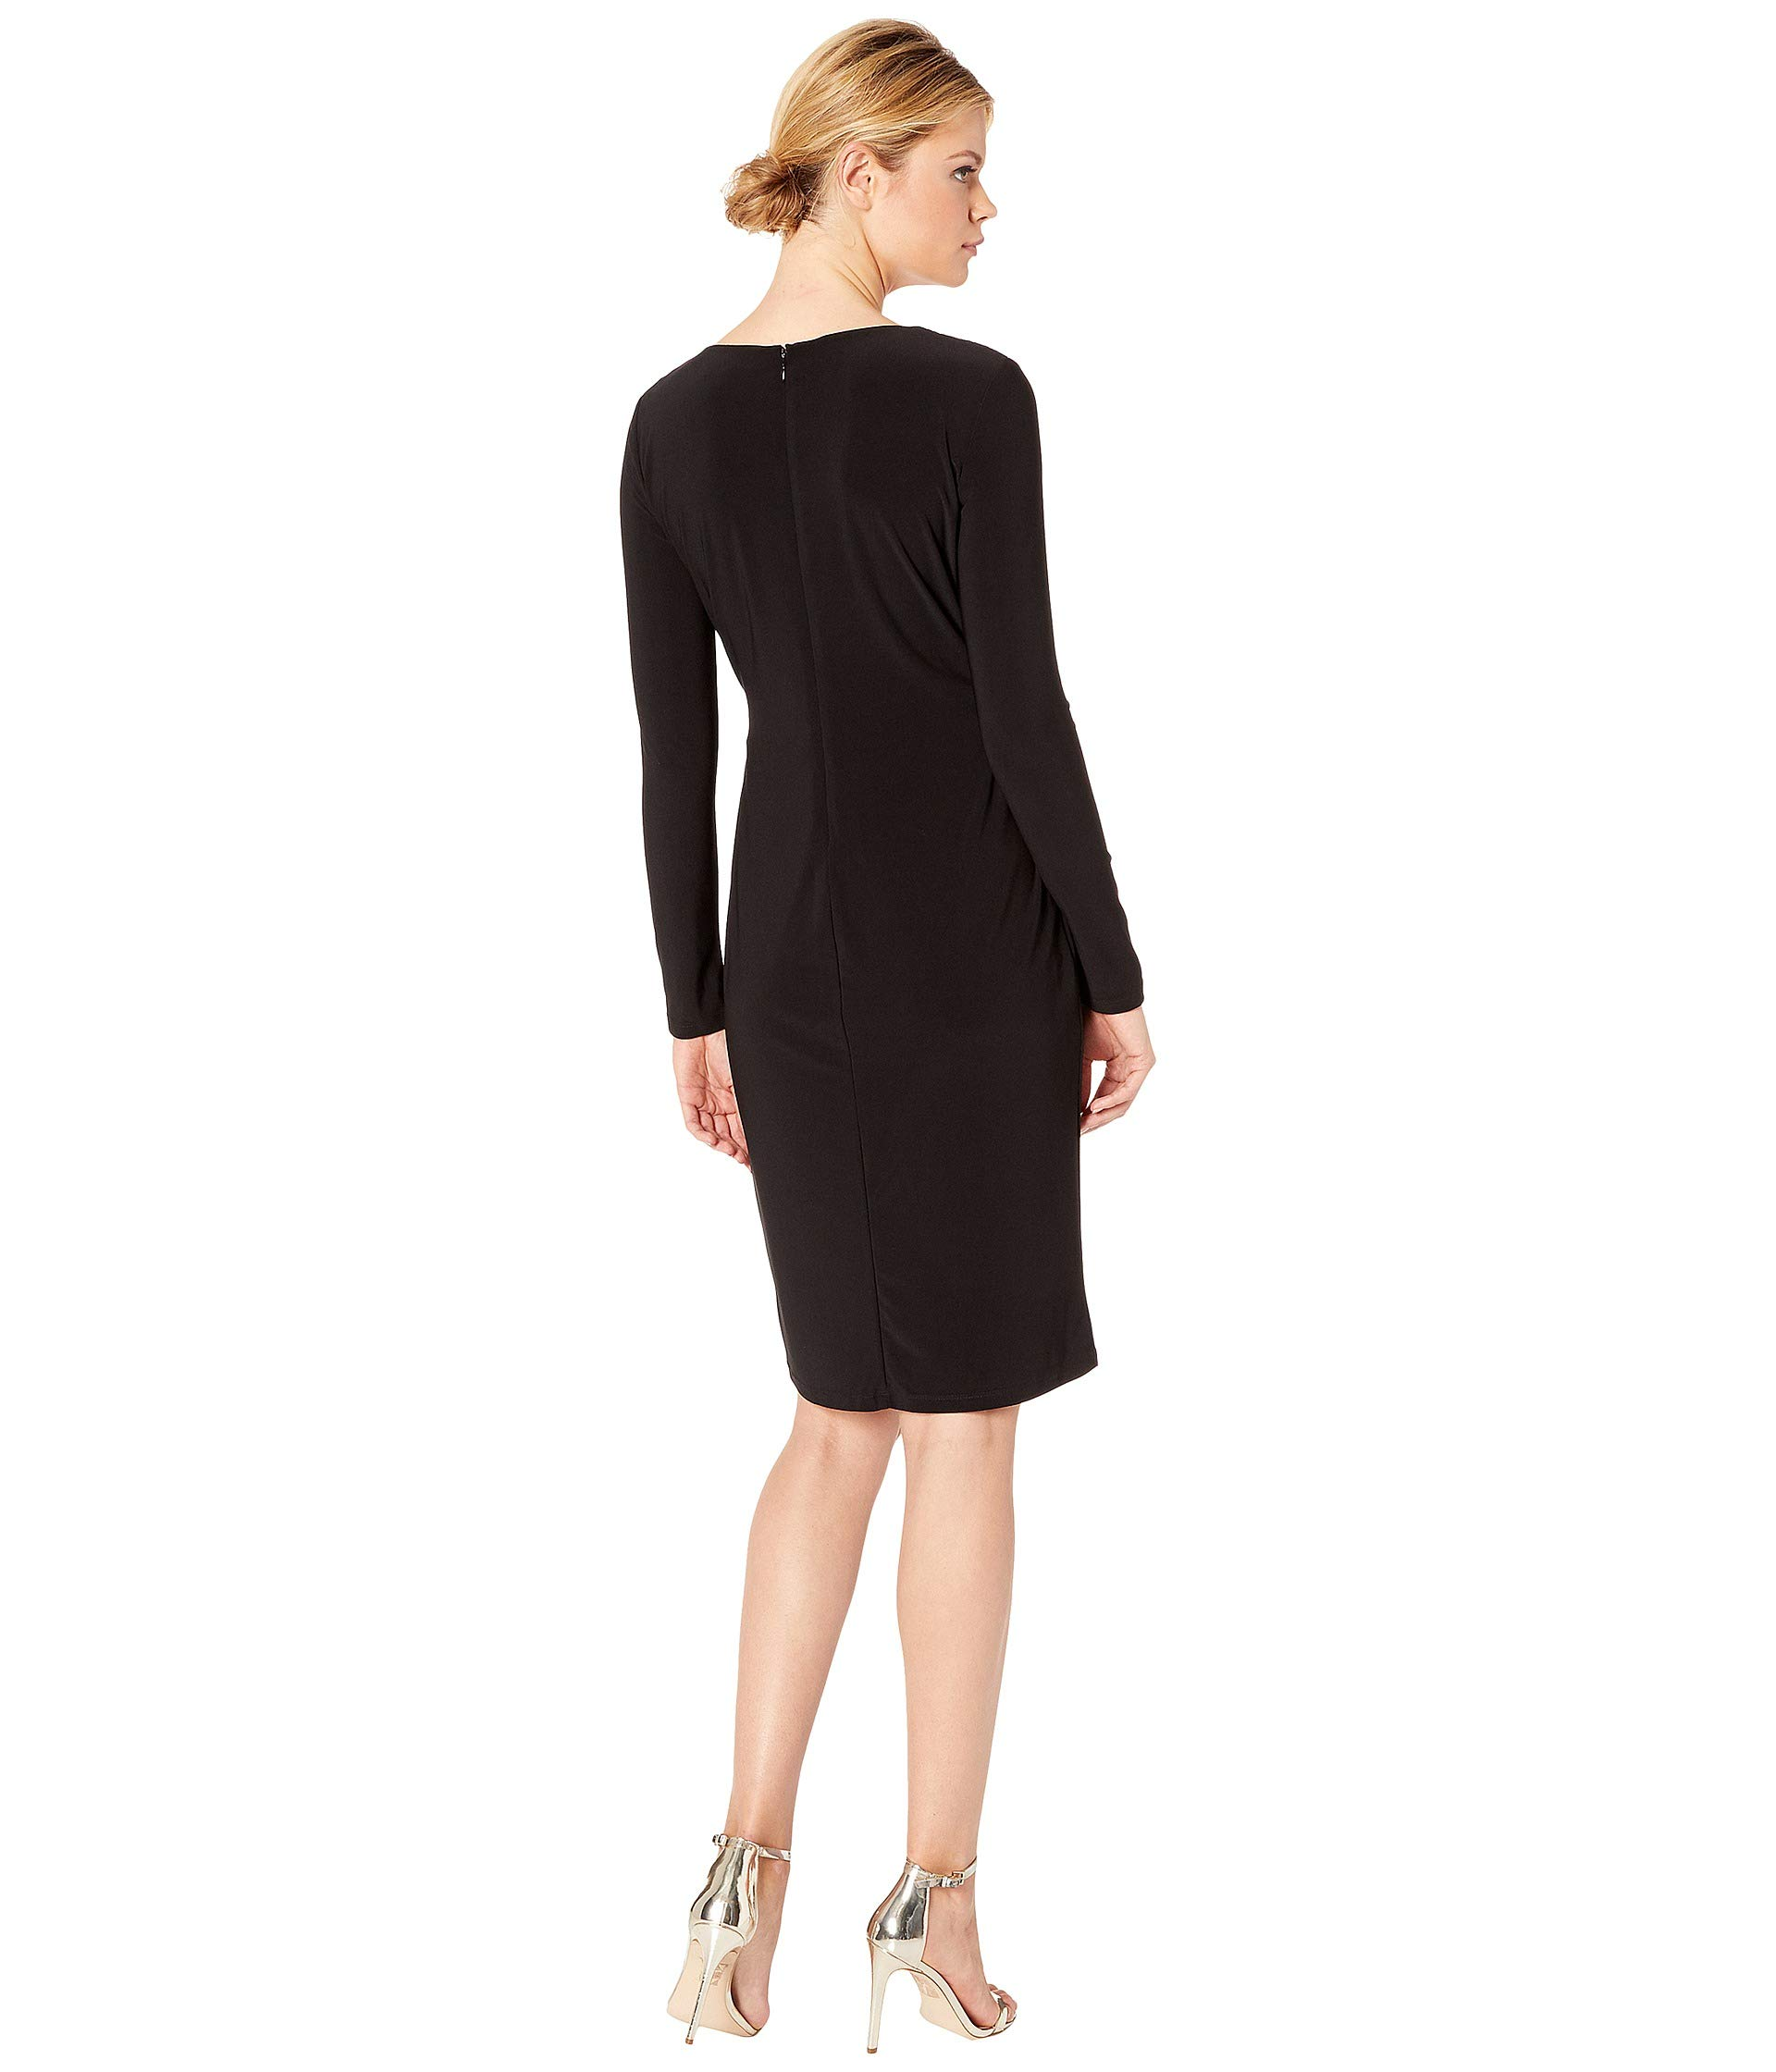 4 4r Day black Ralph Sleeve Shine 3 Dress Jodi Black Lauren Matte Jersey YHZq5